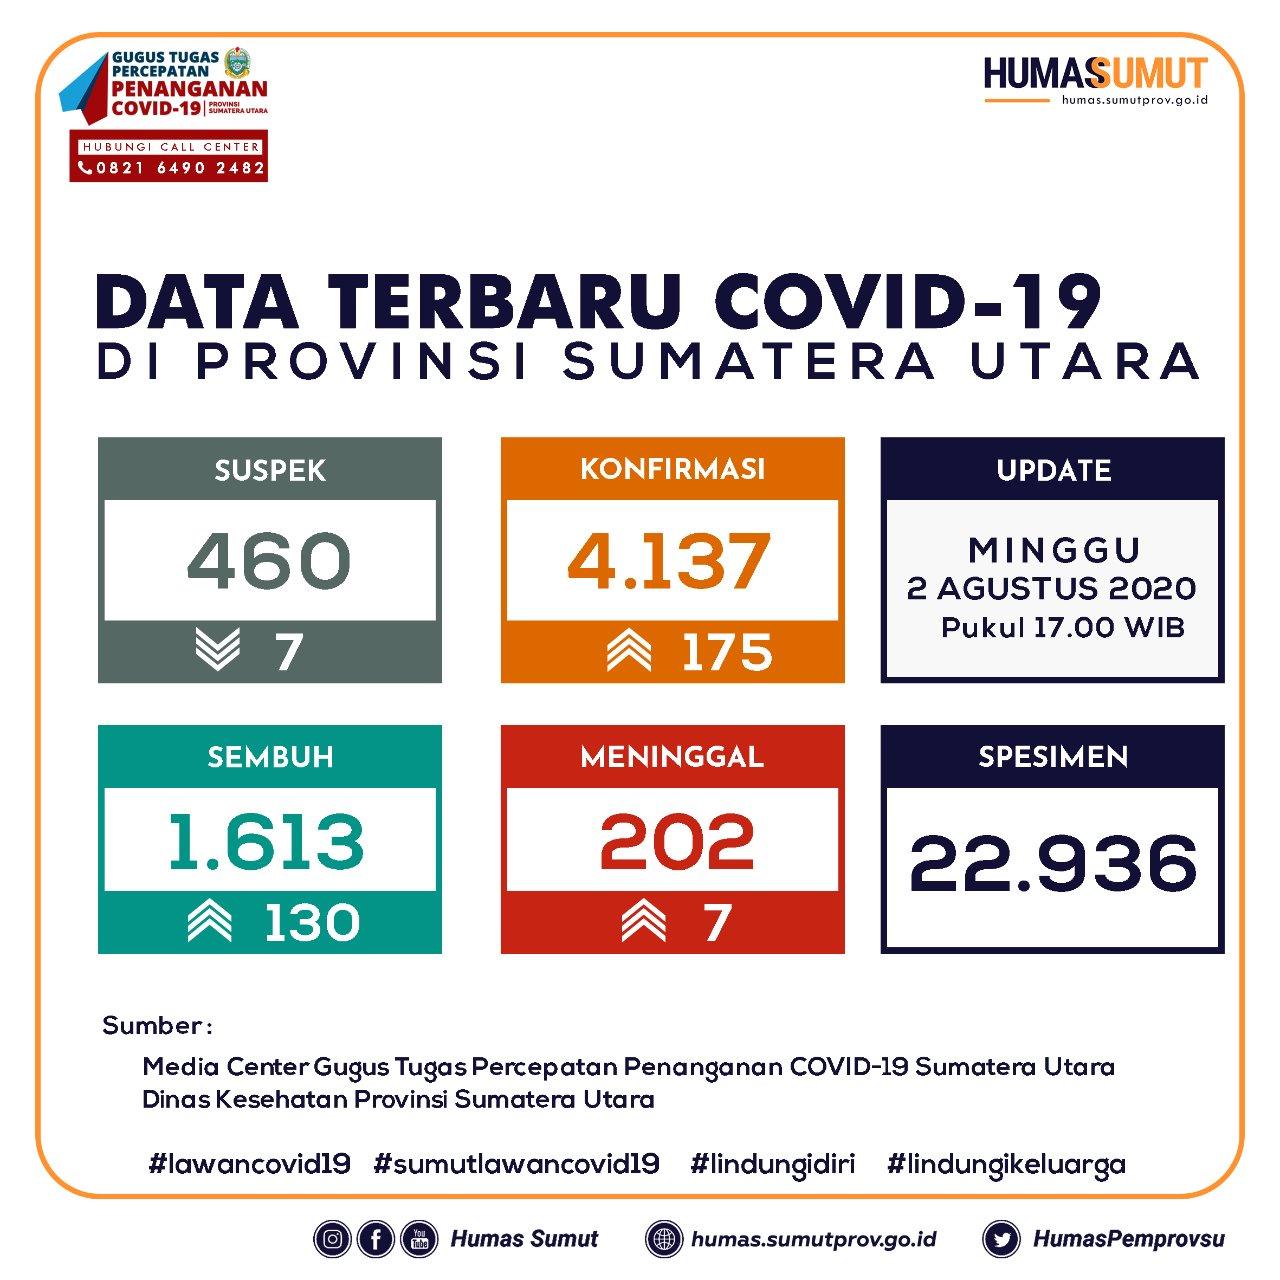 Update Data Covid-19 di Sumatera Utara 2 Agustus 2020